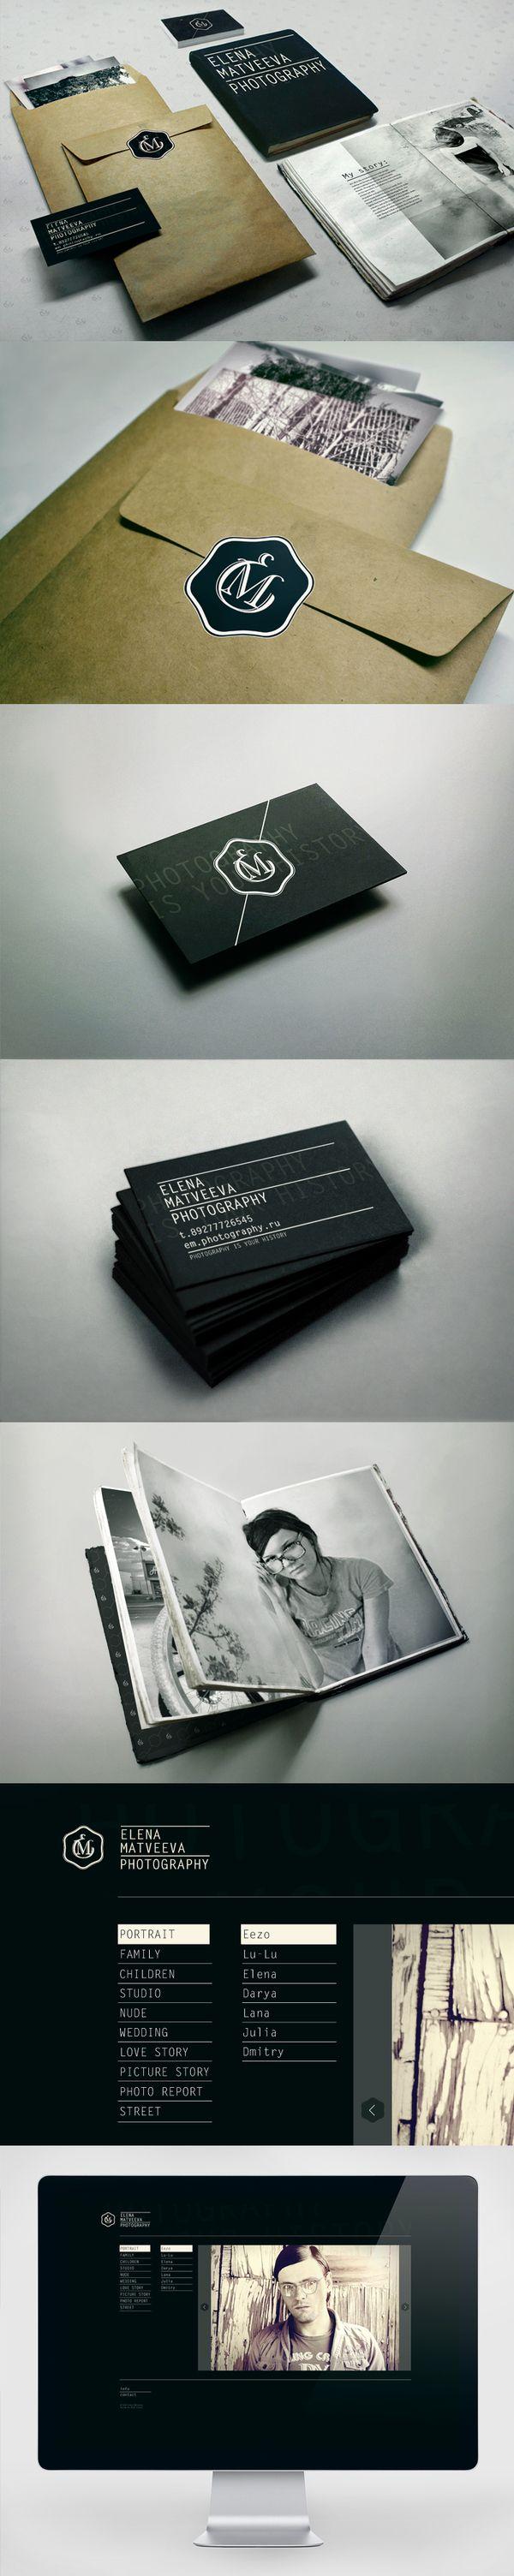 E.M. Photography by Igor Hrupin